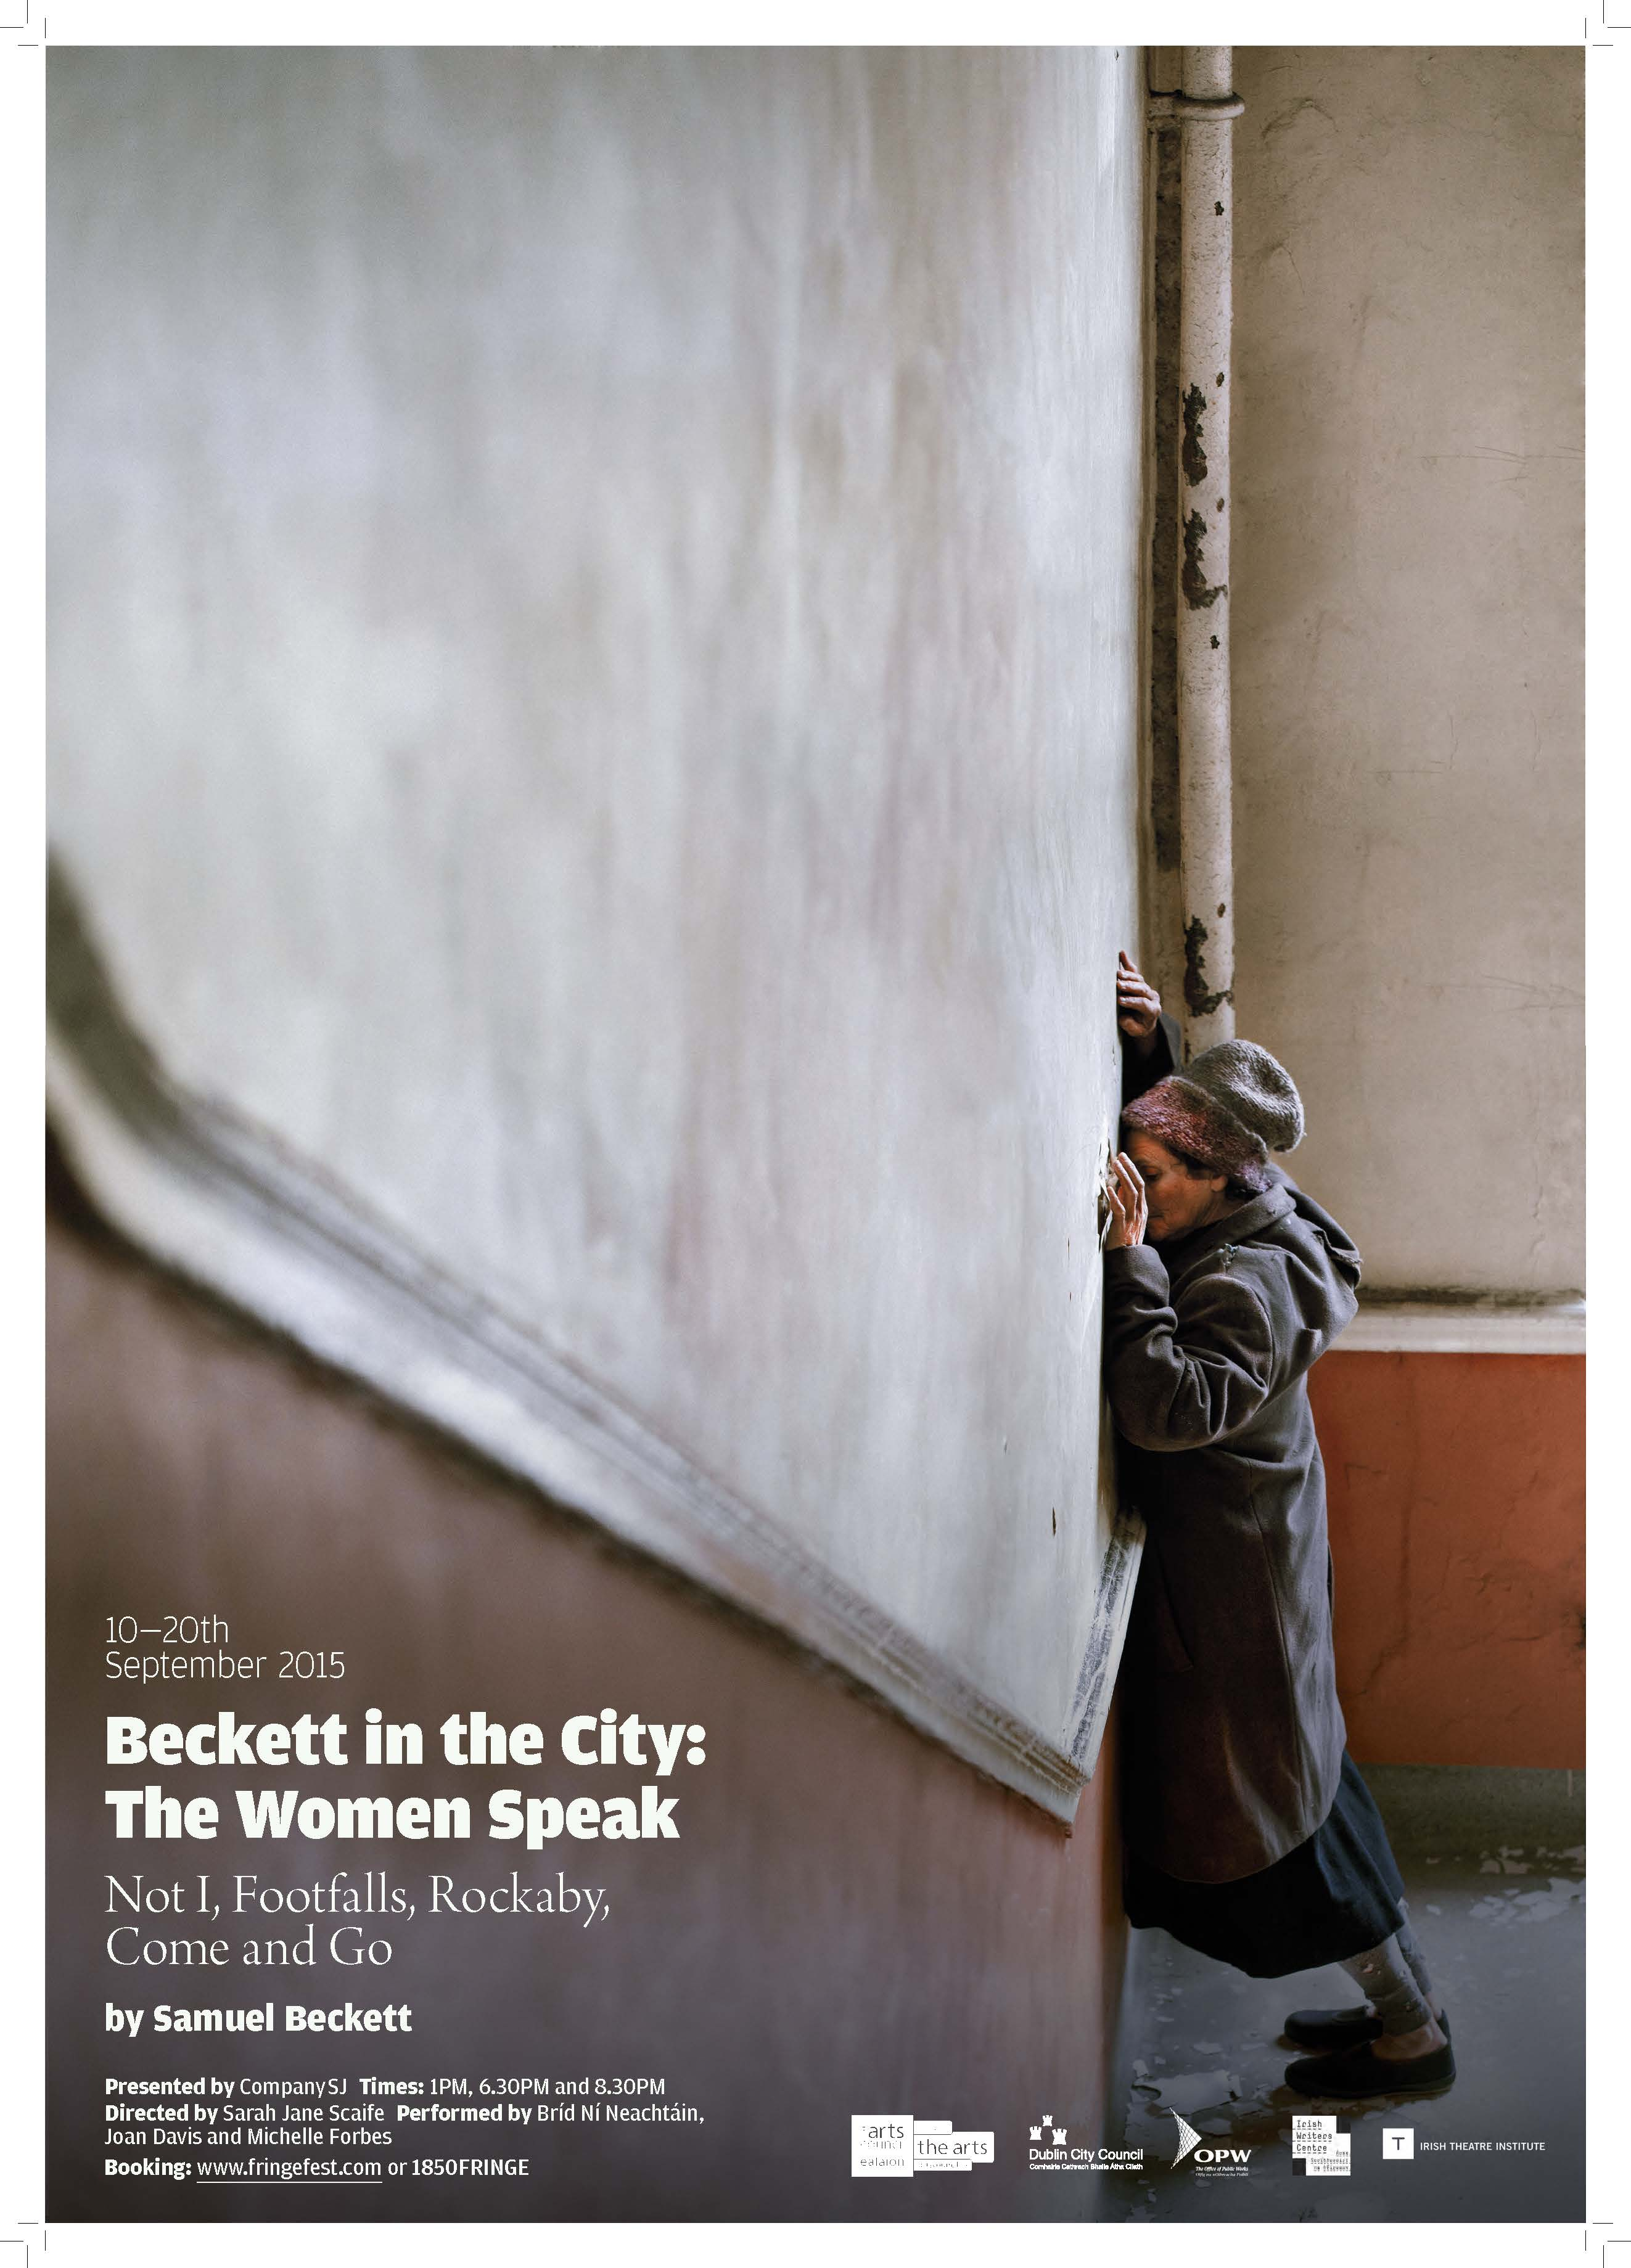 The Woman Speak by Samuel Beckett. Company SJ. Tiger Dublin Fringe